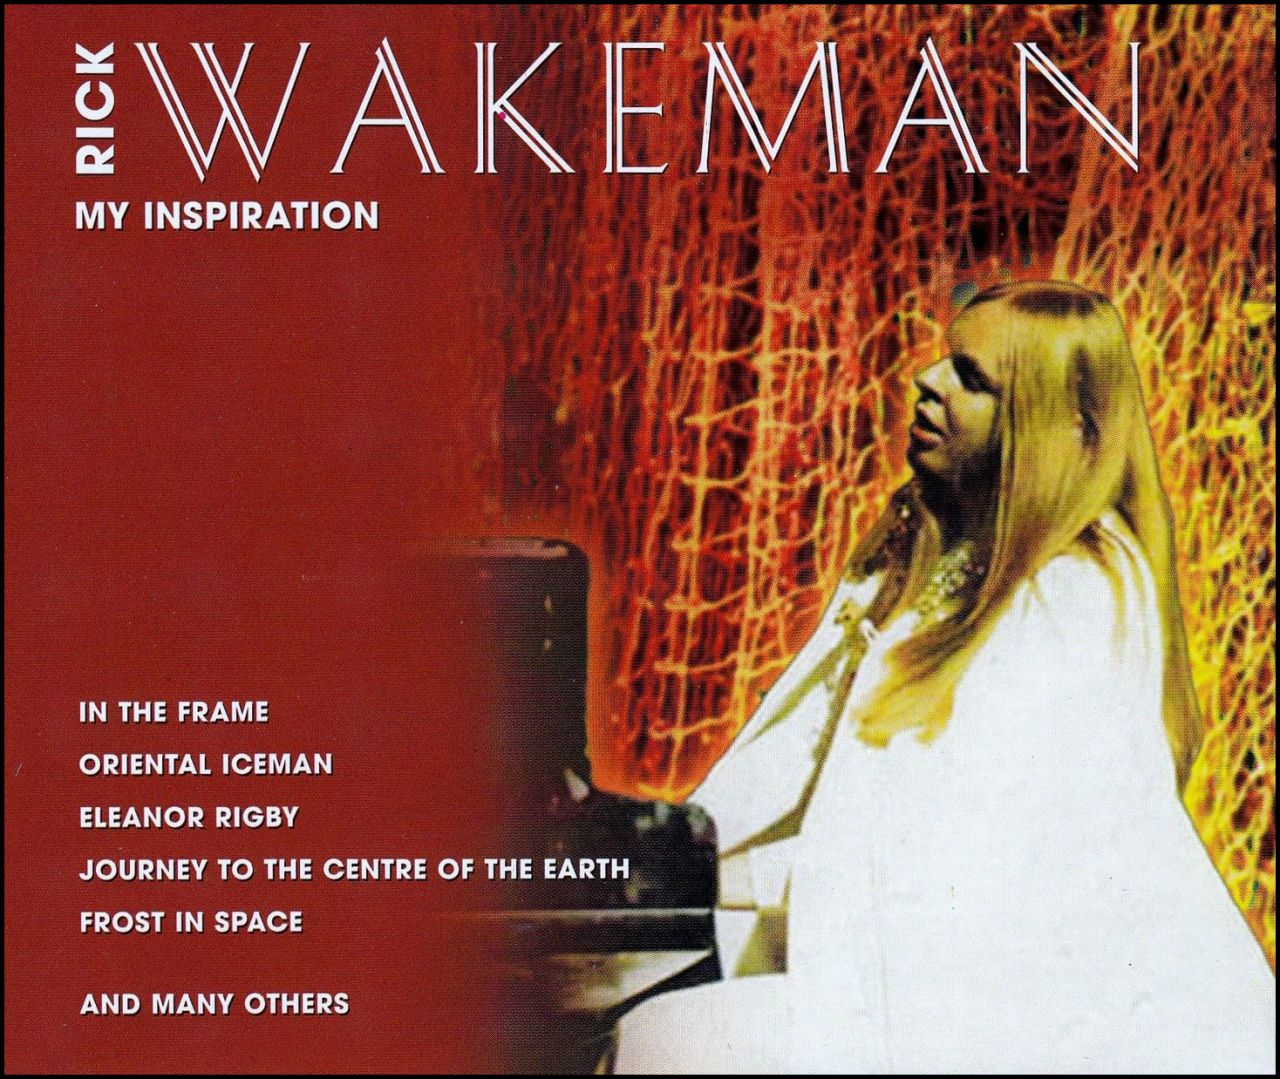 Rick Wakeman: My Inspiration (3 CD)